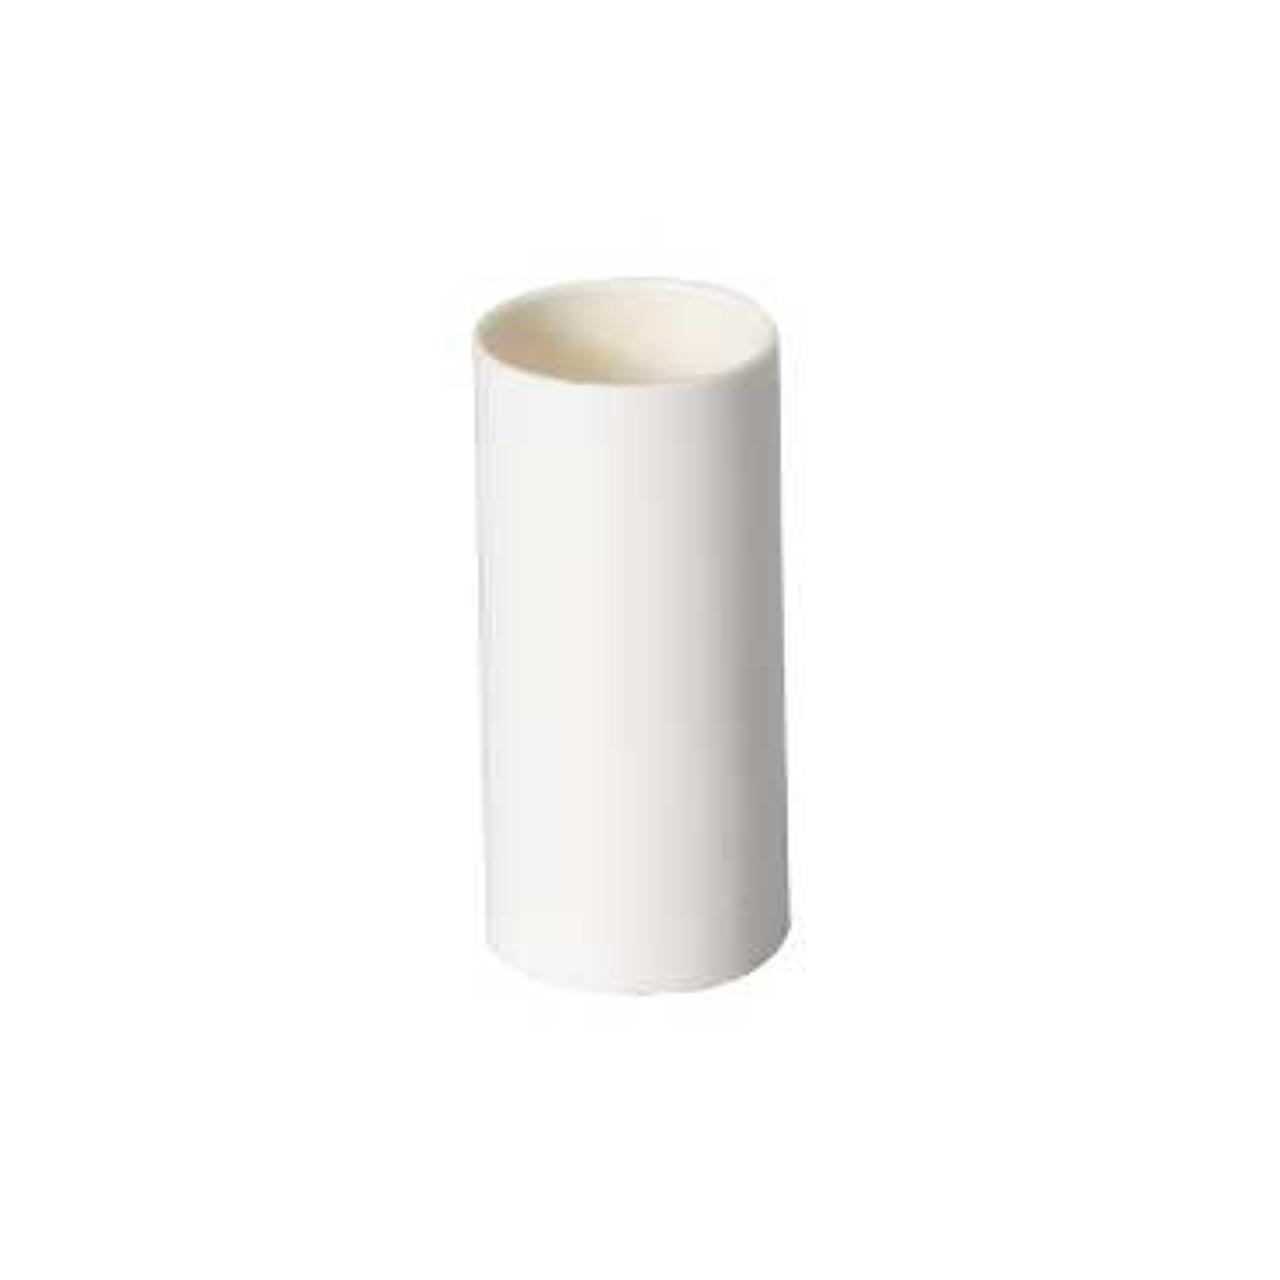 manchon pour tube irl 3321 diam tre 25 mm blanc schnei. Black Bedroom Furniture Sets. Home Design Ideas